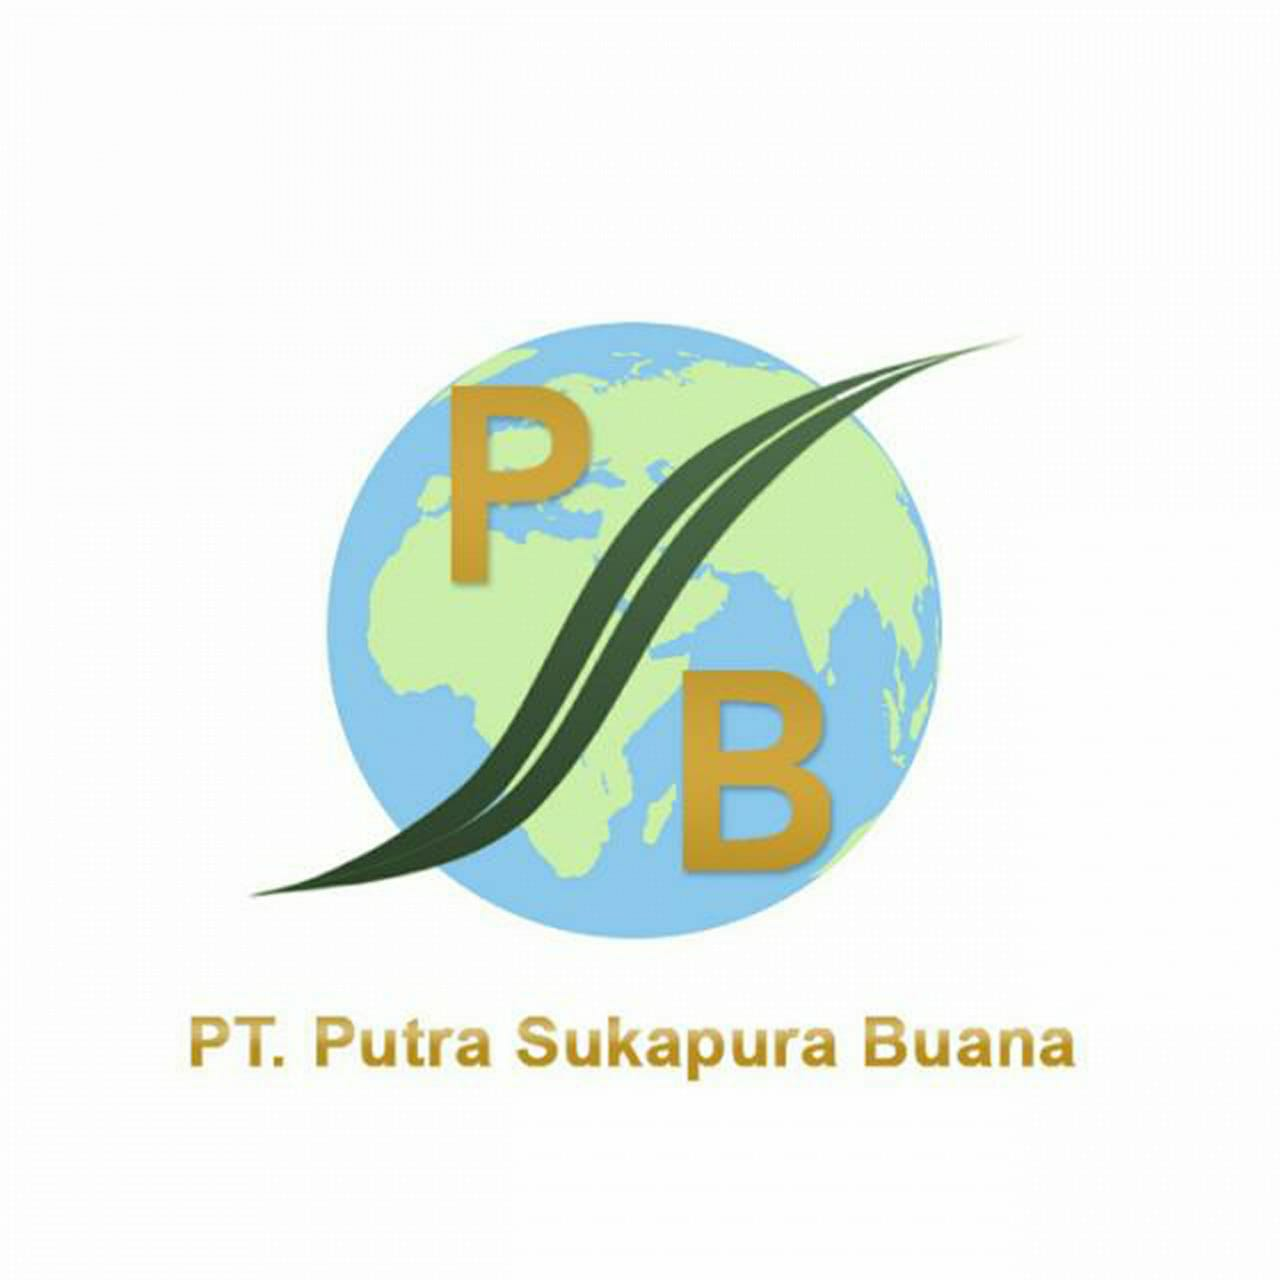 Logo PT. Putra Sukapura Buana